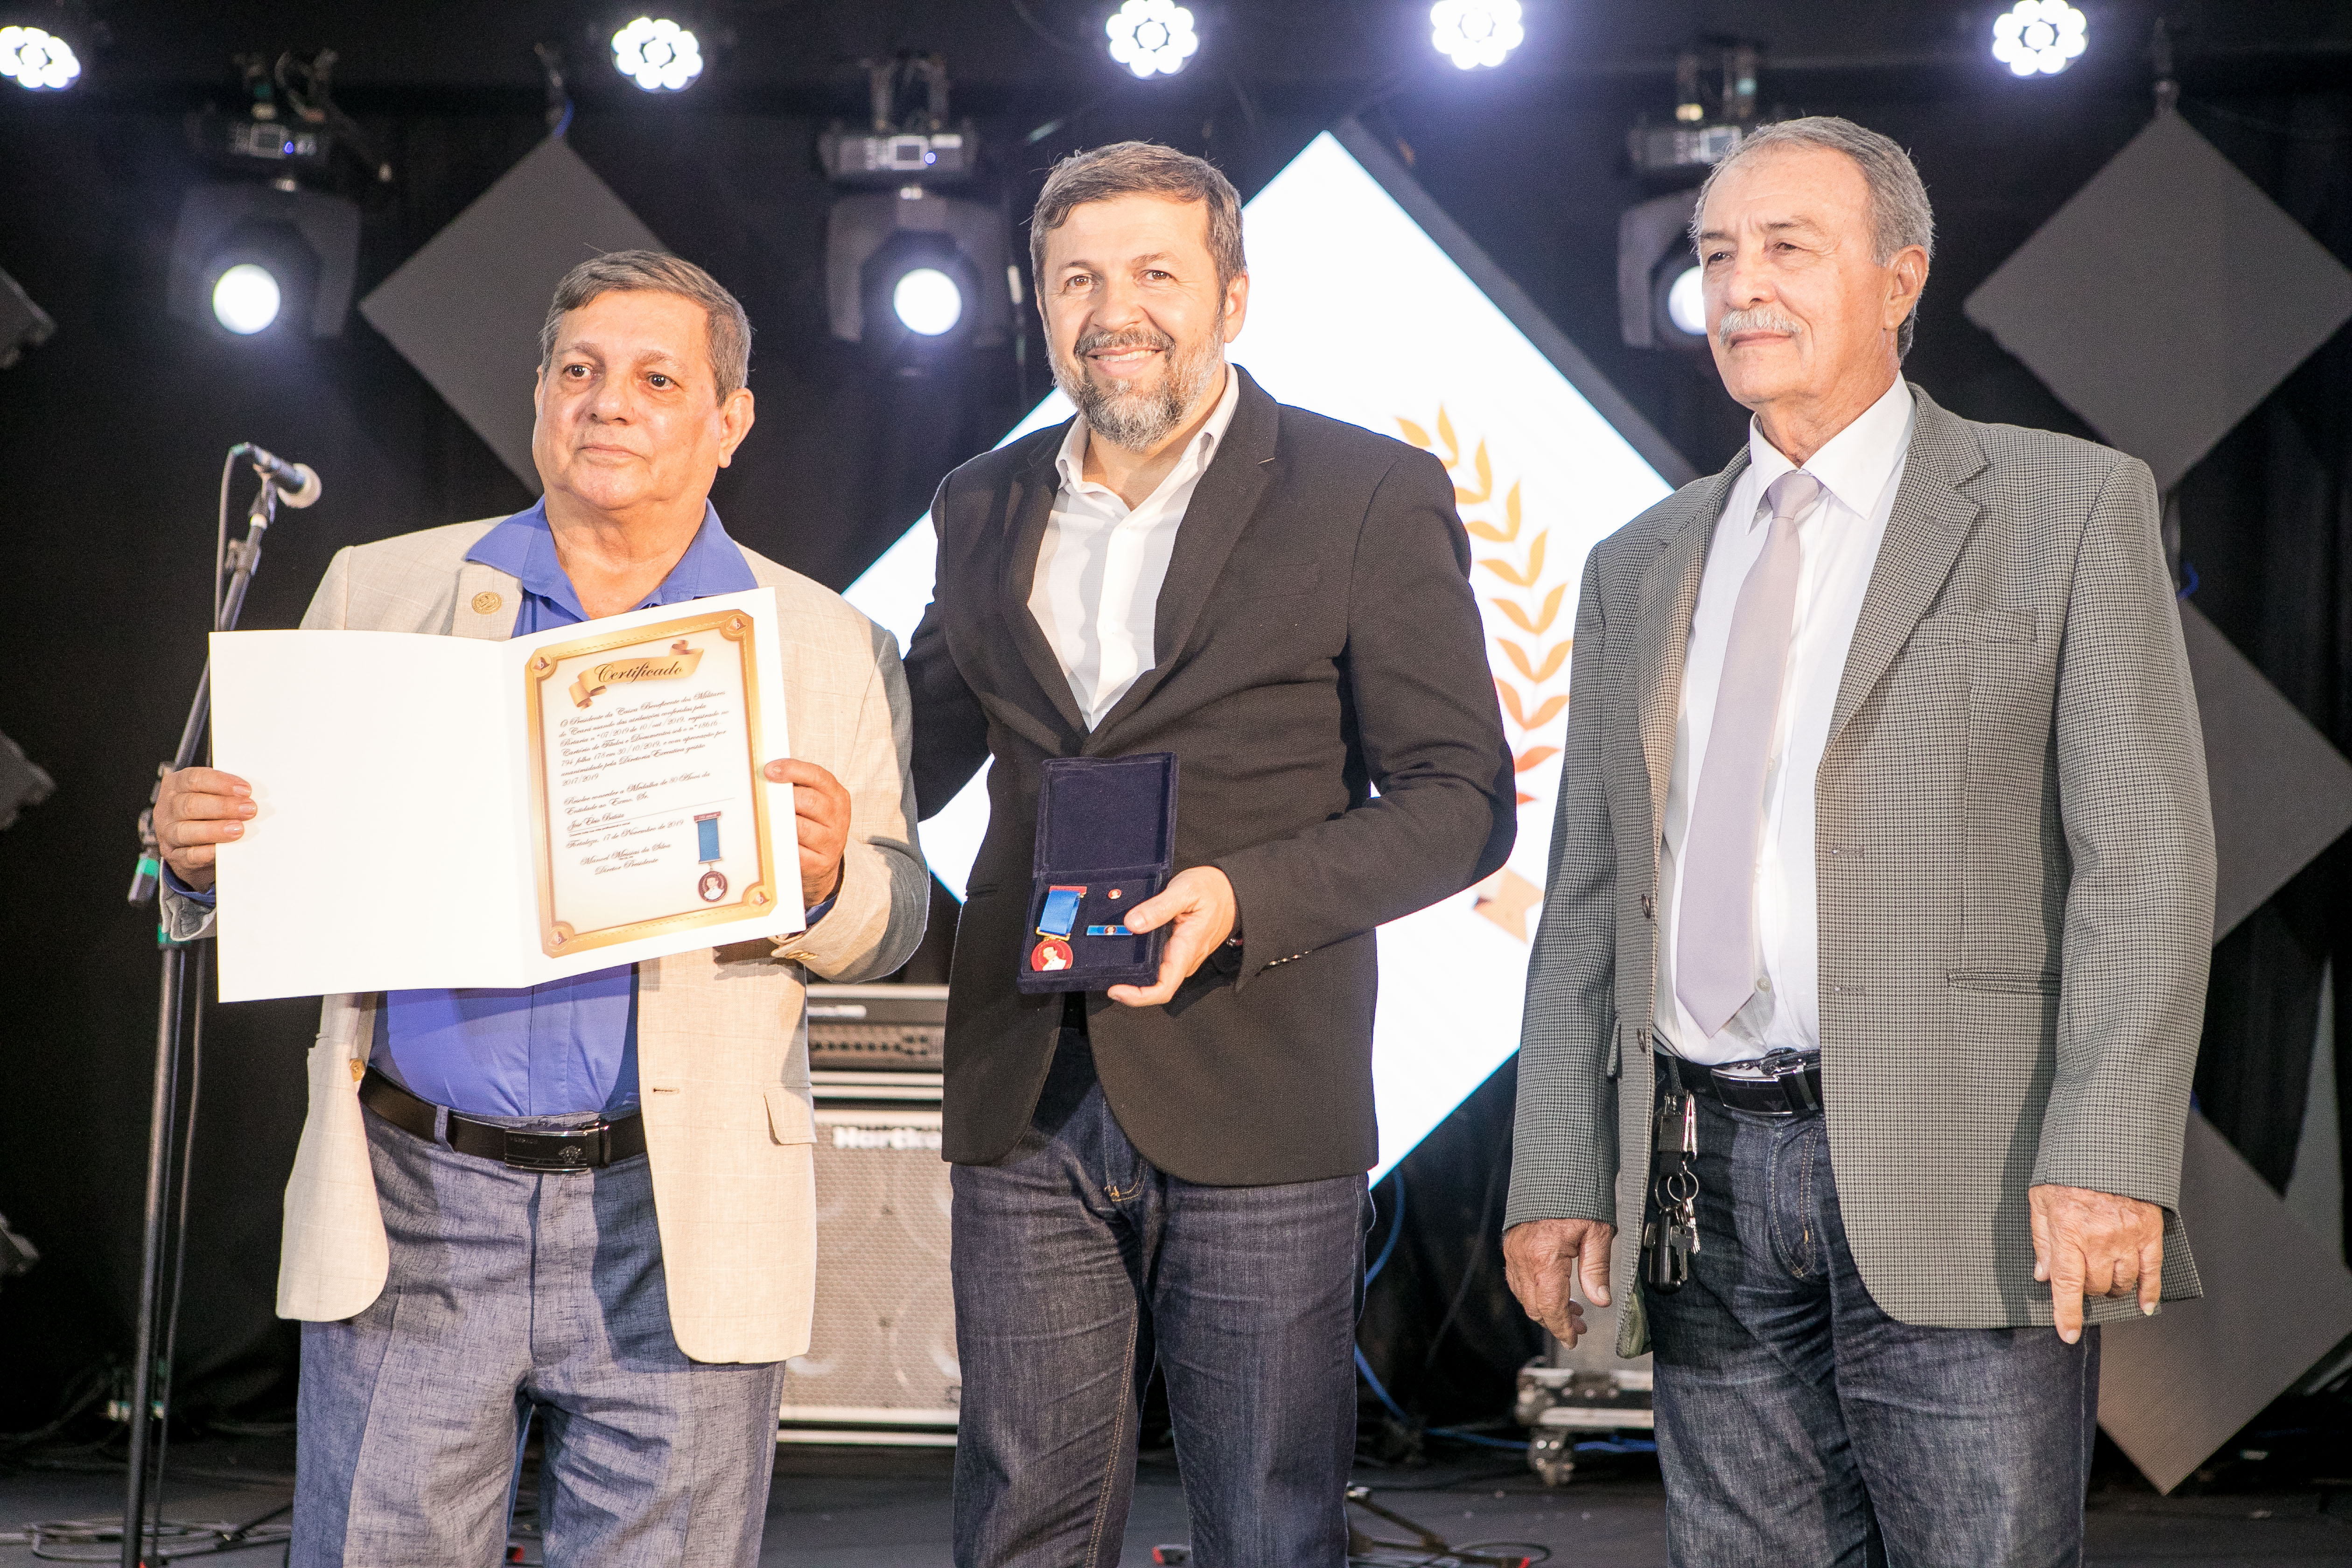 Élcio Batista é agraciado com a Medalha Djalma Baima pela Caixa Beneficente dos Militares do Ceará